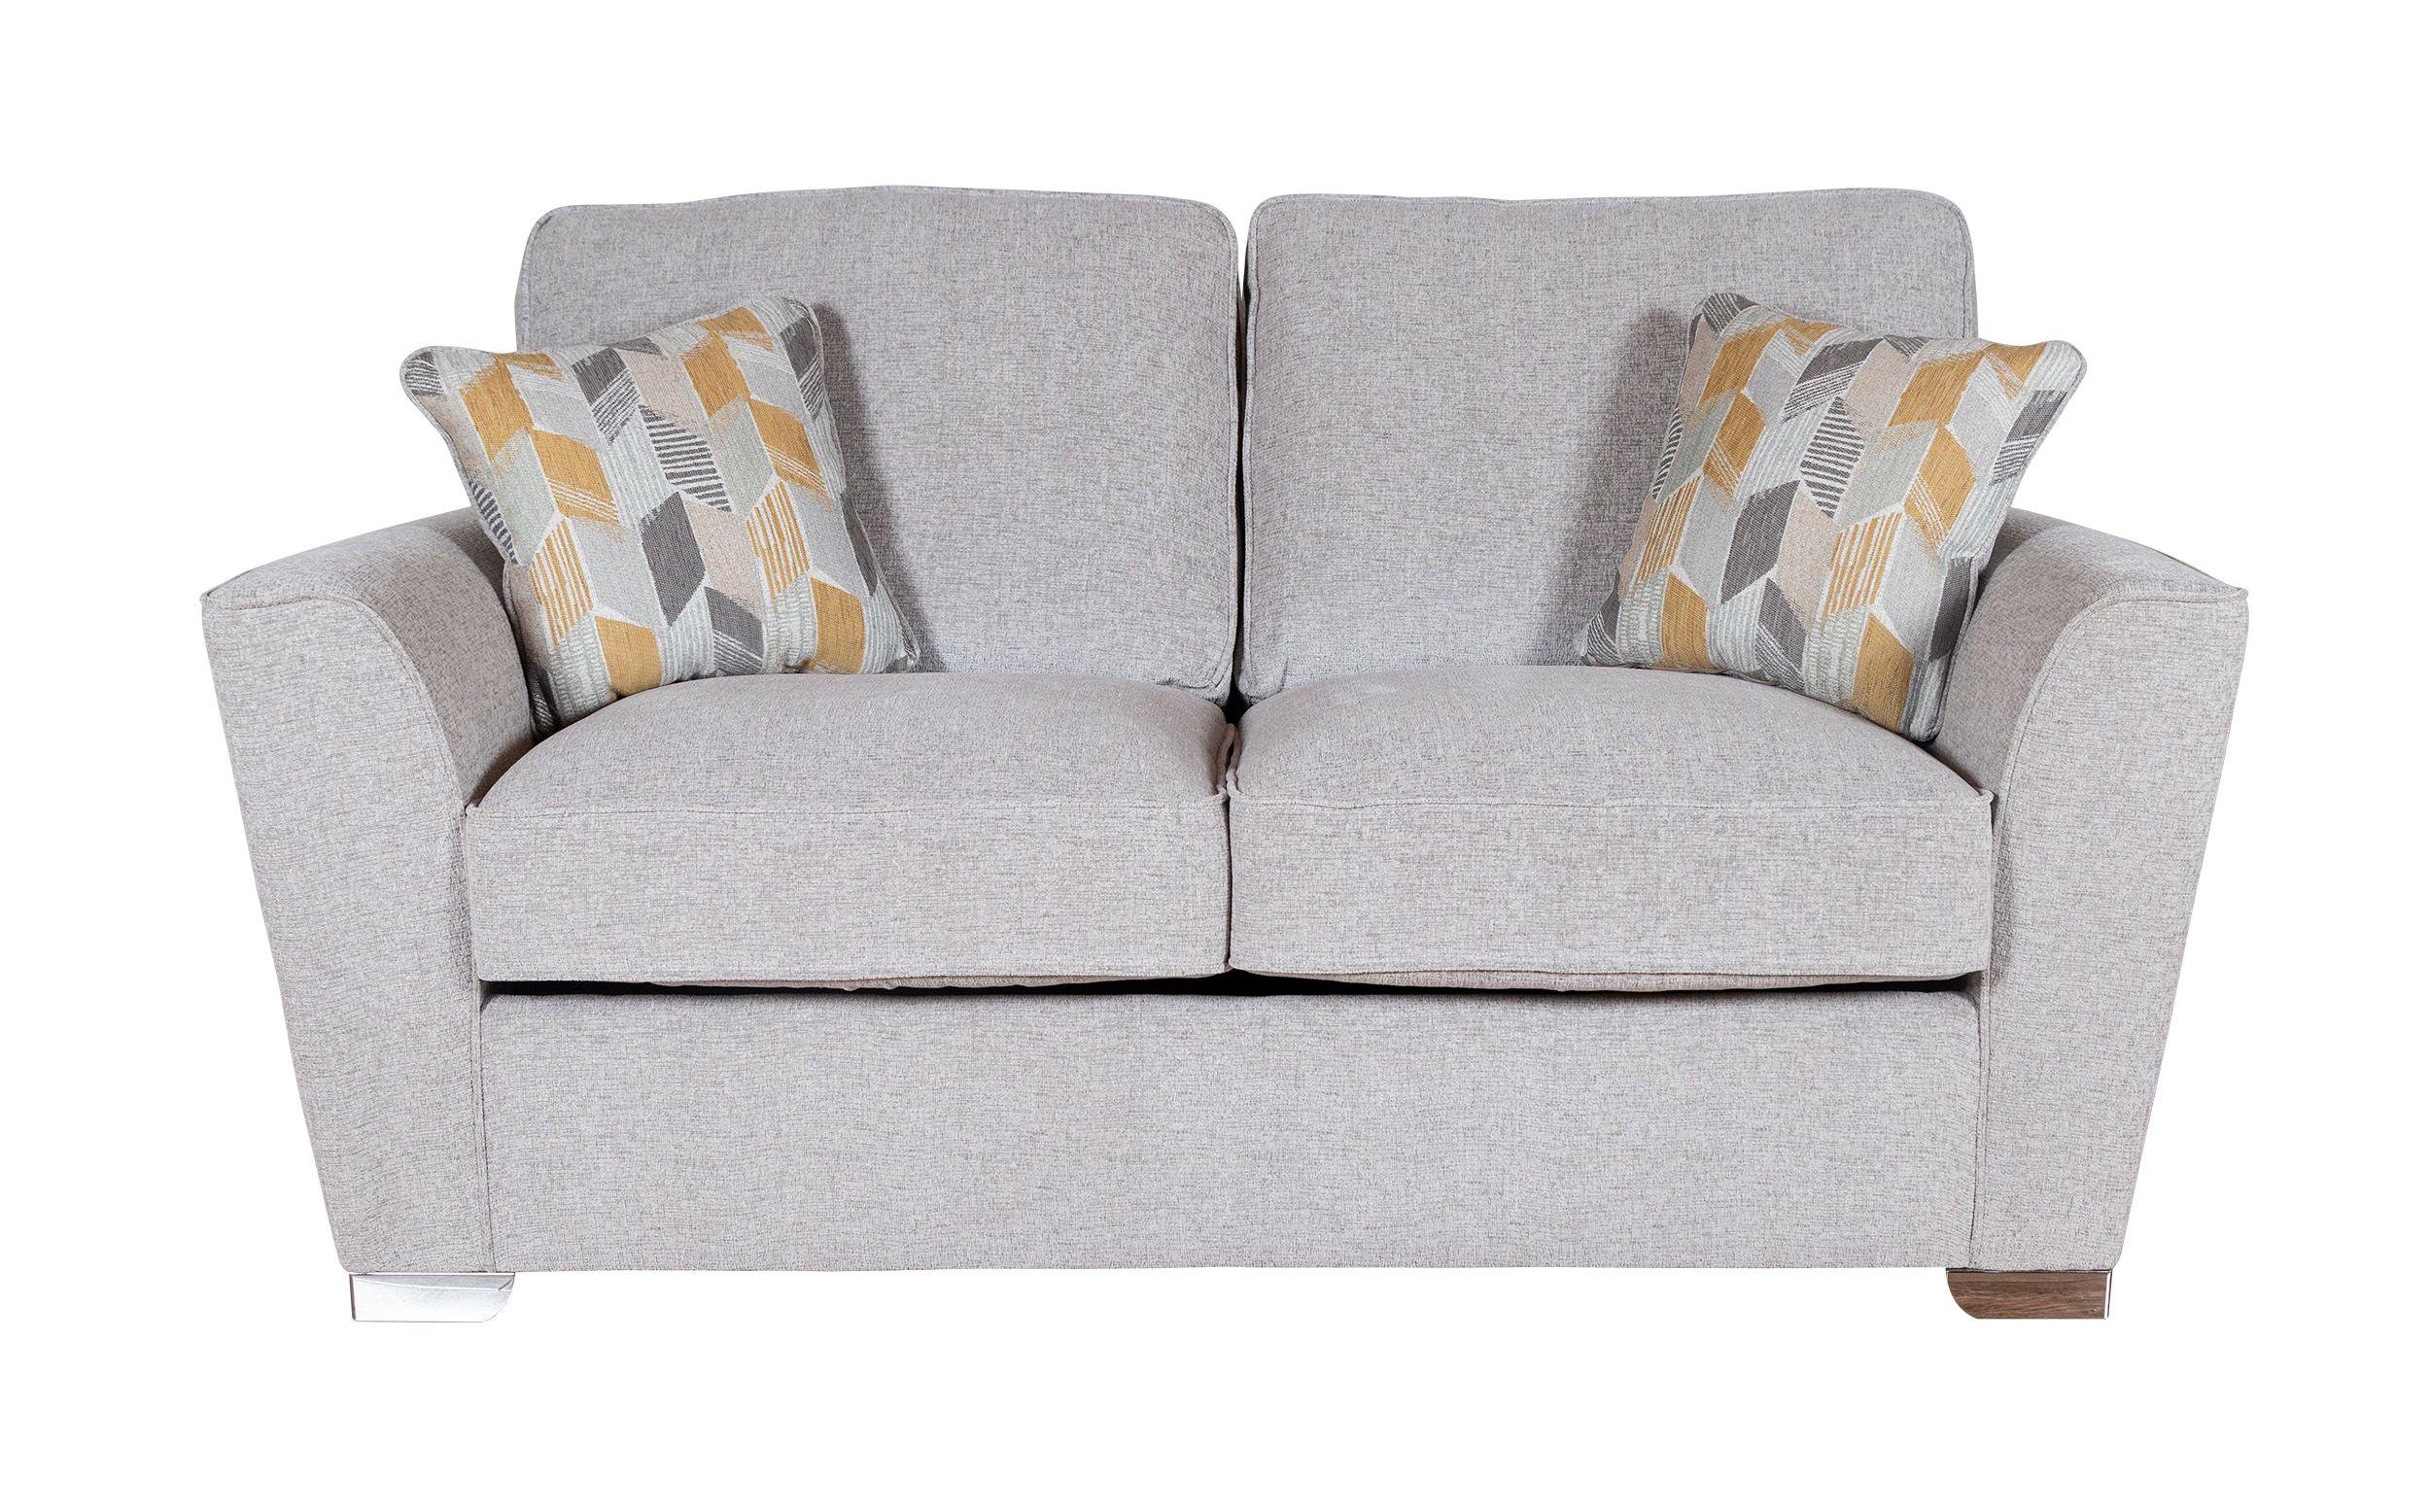 Fantasy 80cm Sofa Bed